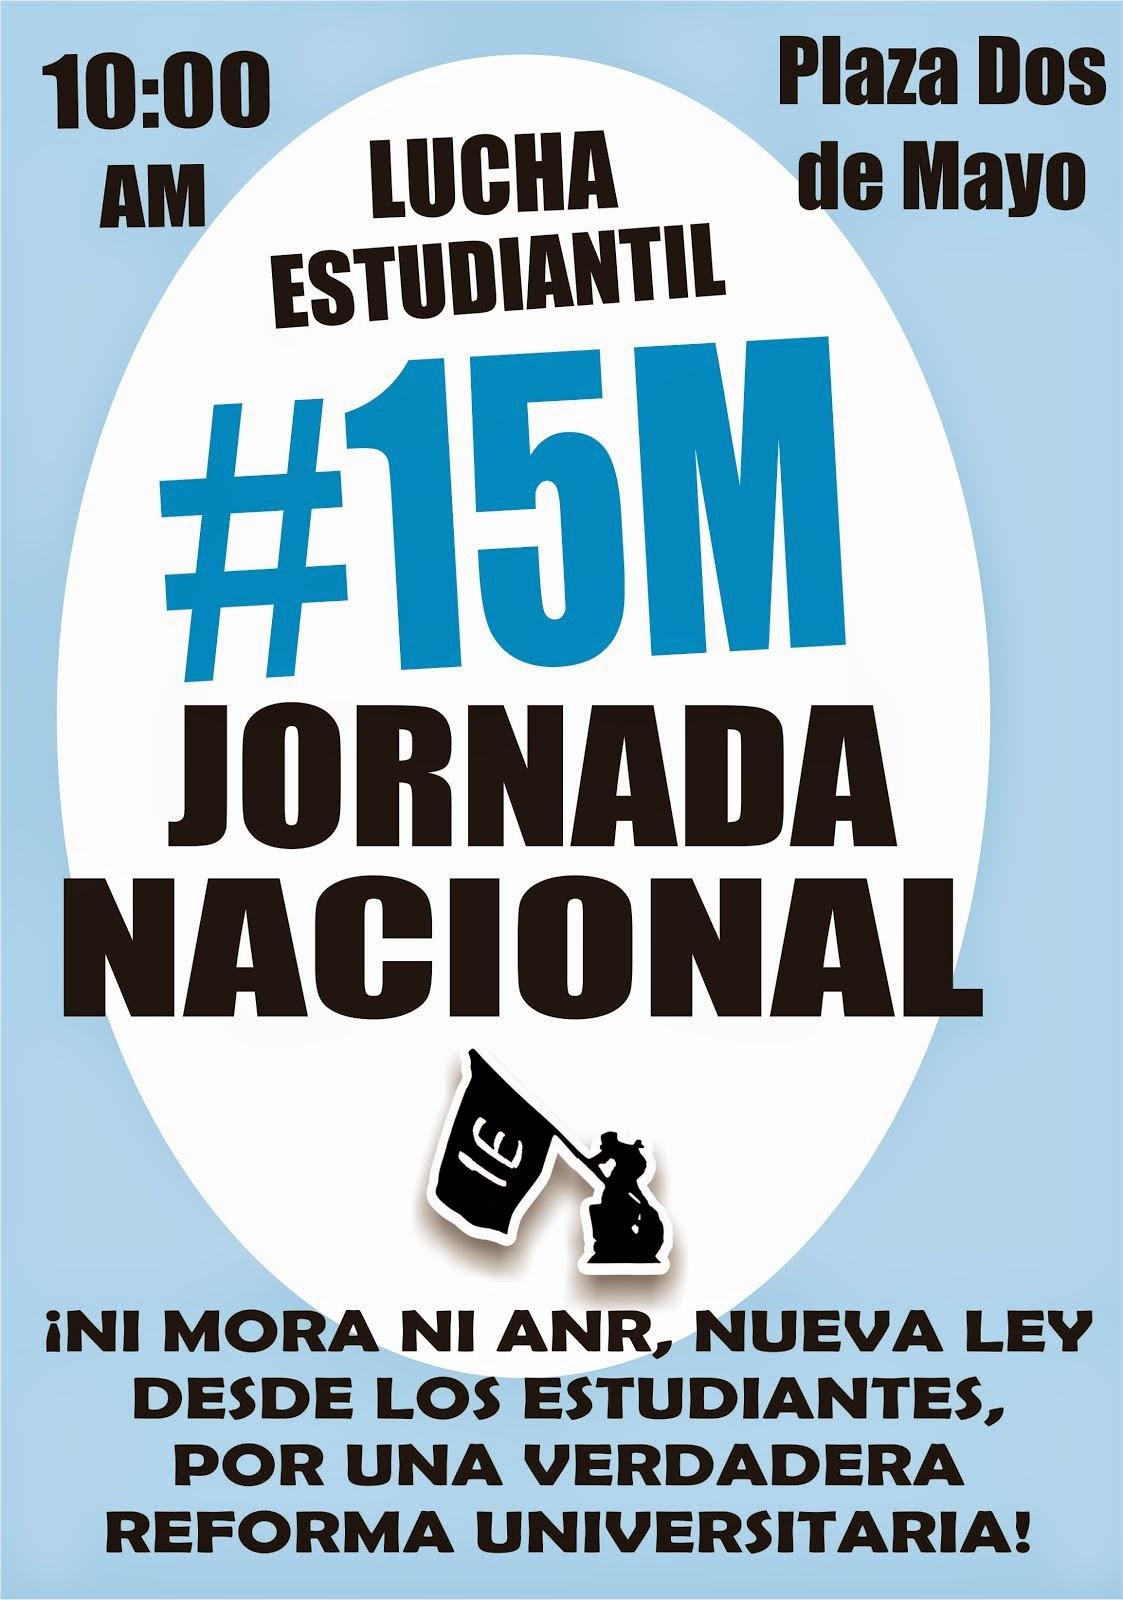 LUCHA ESTUDIANTIL #15M